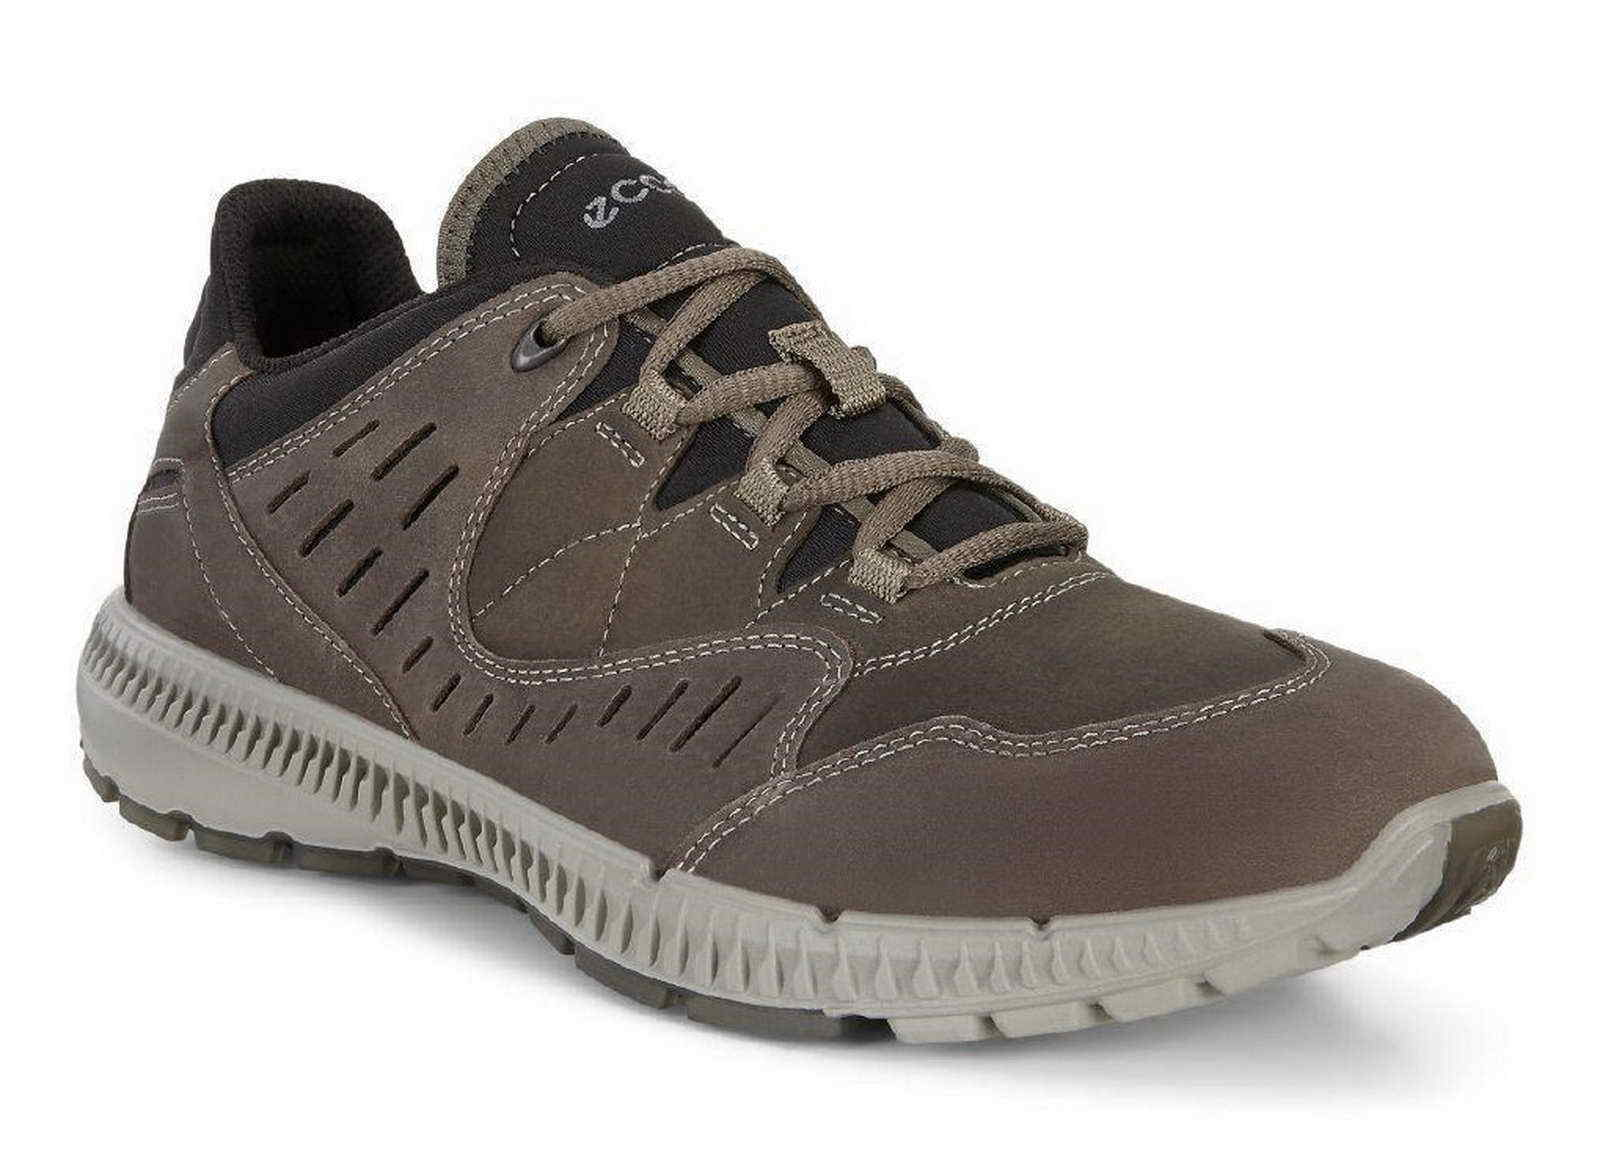 Ecco Sneaker Terrawalk Trekking grün braun tarnak Schnür 870504 55894